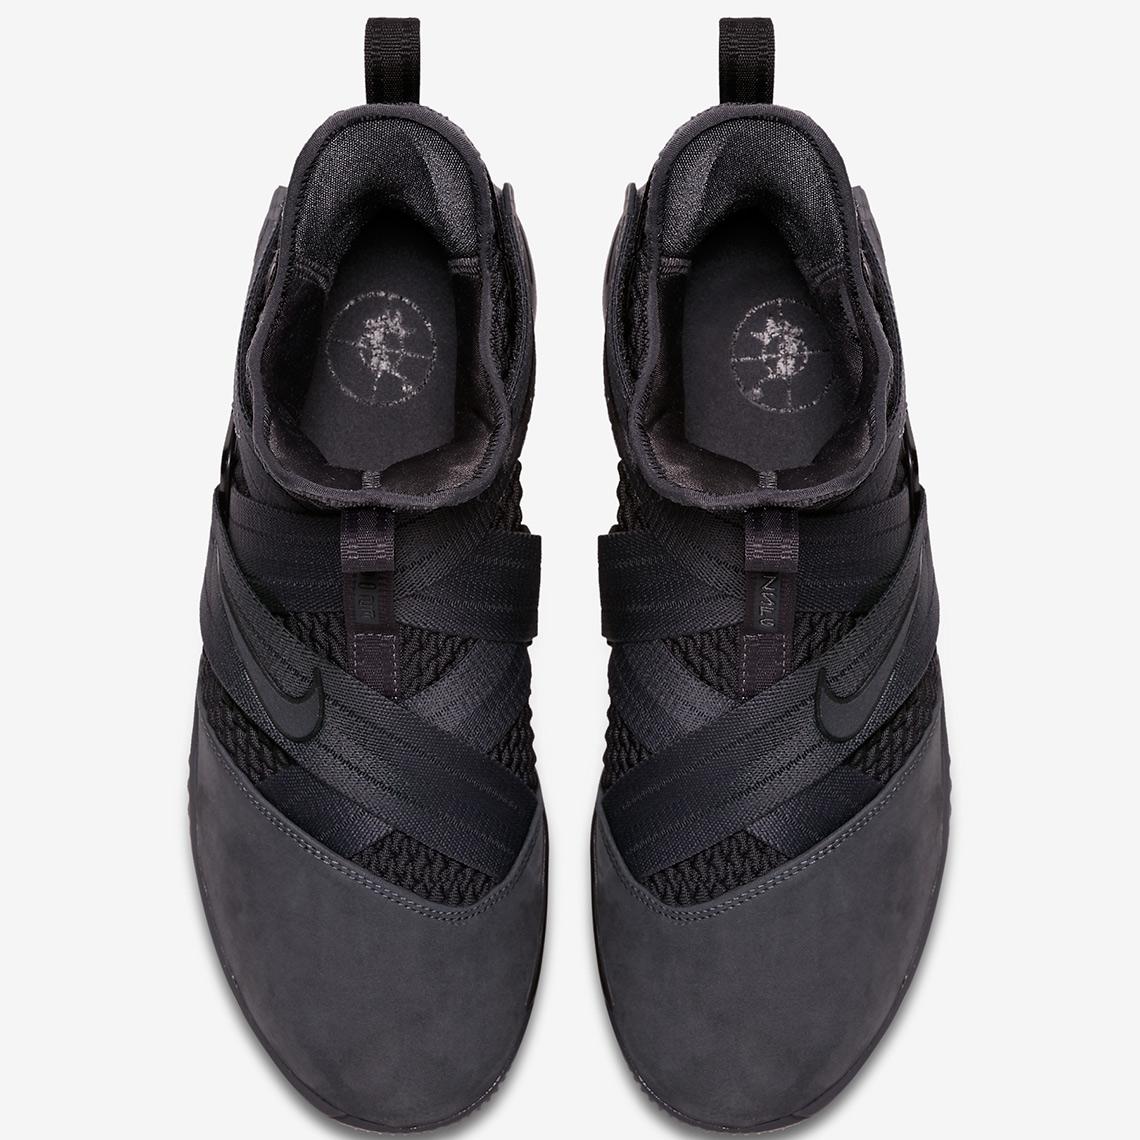 promo code 806c9 2d995 Nike LeBron Soldier 12